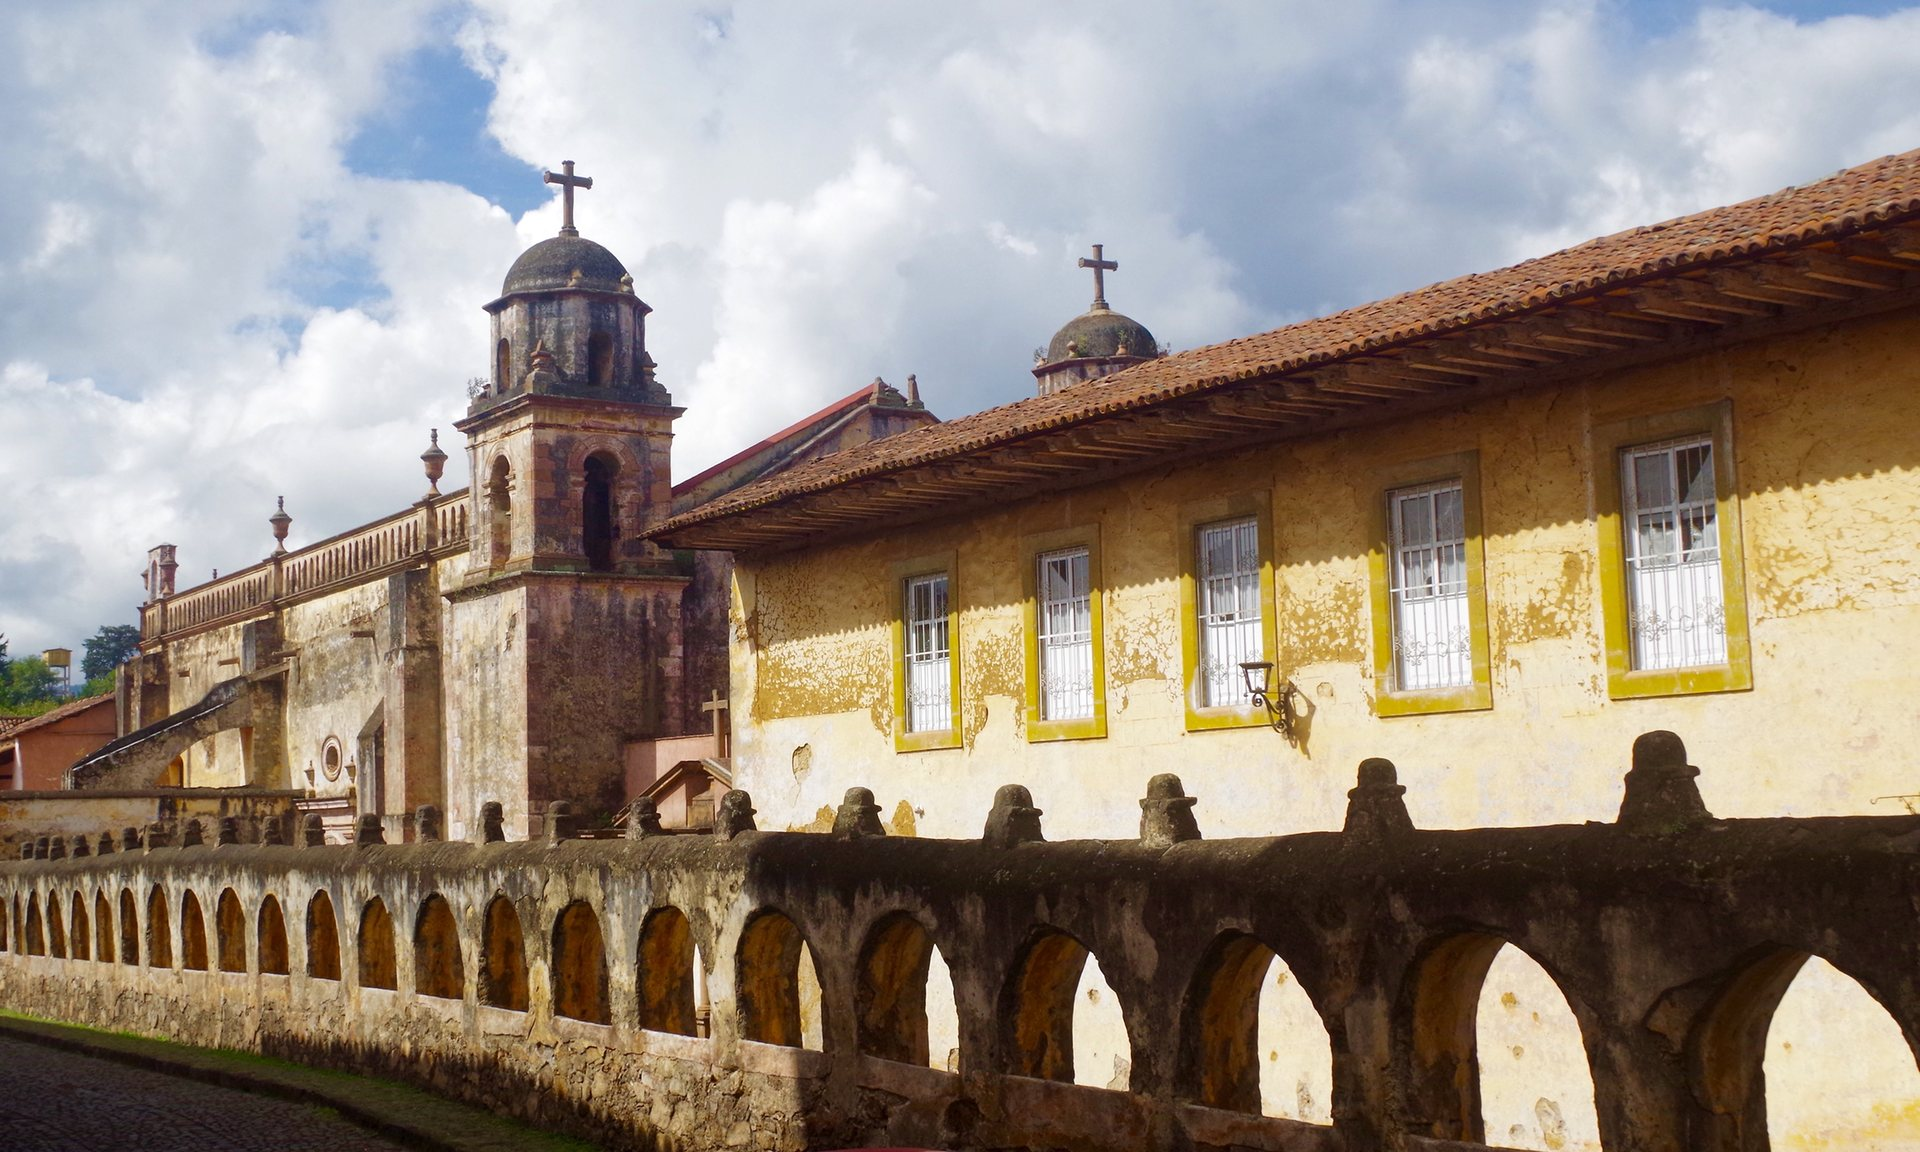 Templo del Hospitalito. All photographs: Erica Buist